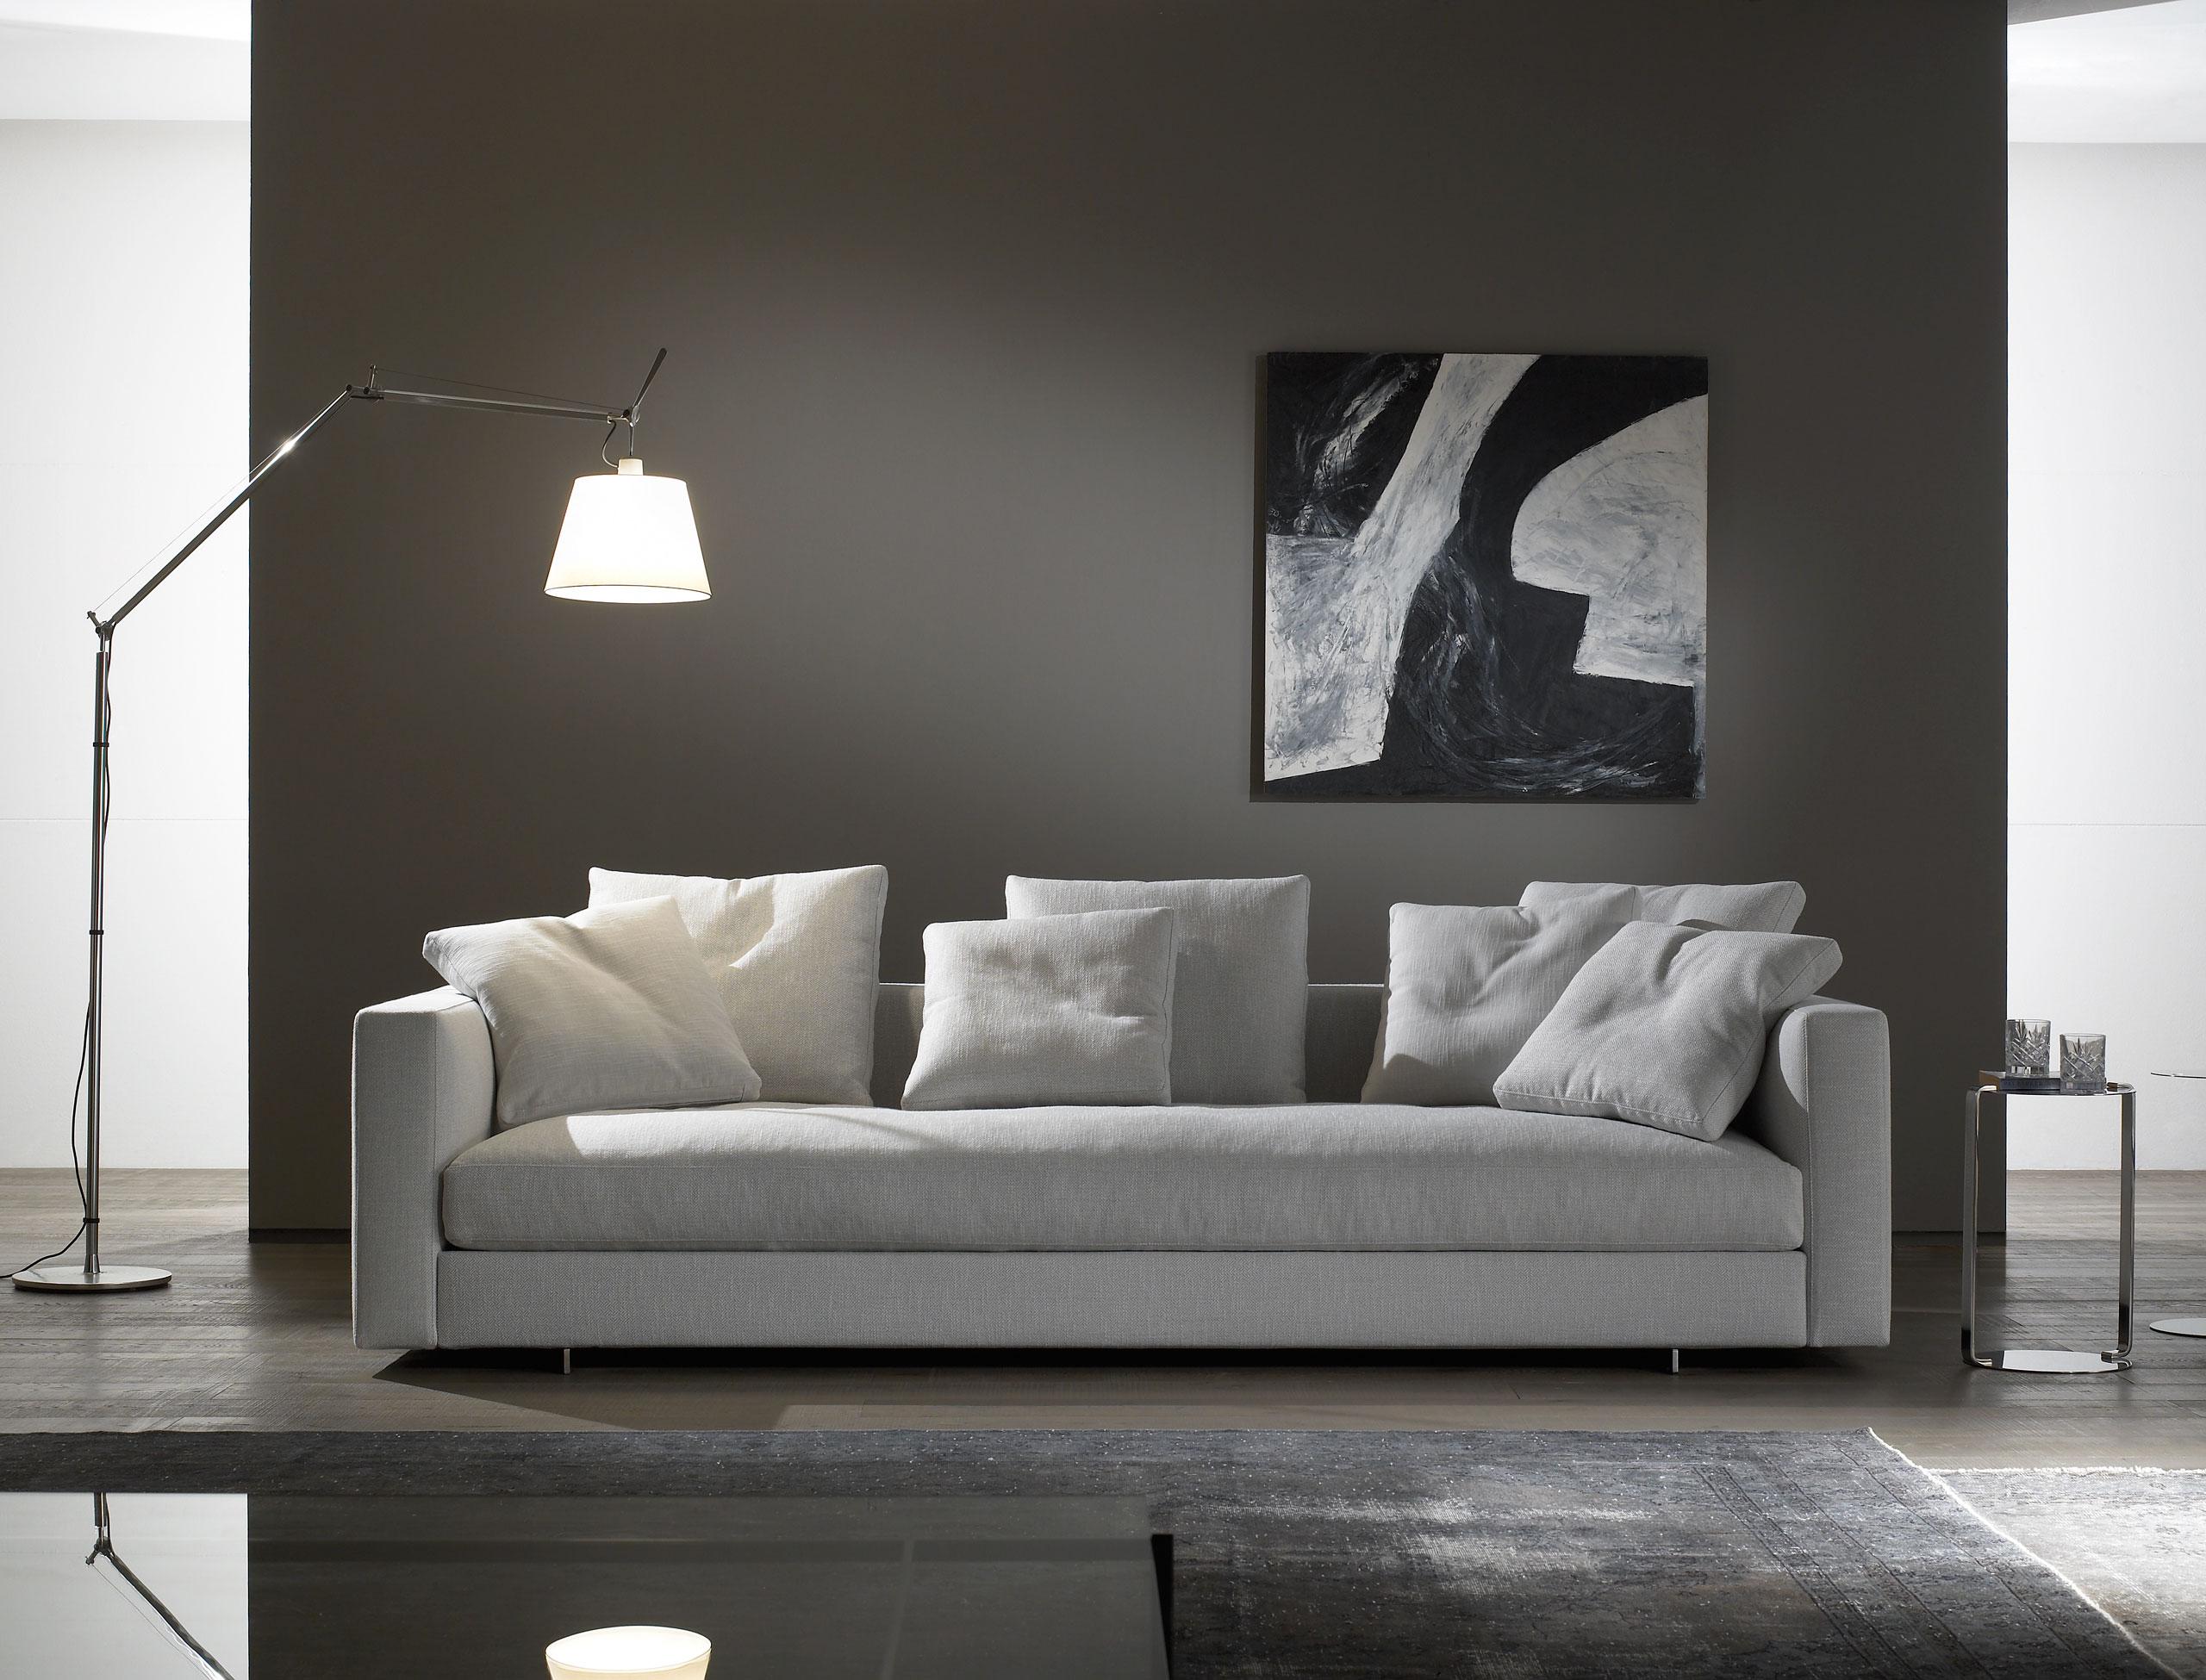 sofa gris perla casadesus muebles mallorca